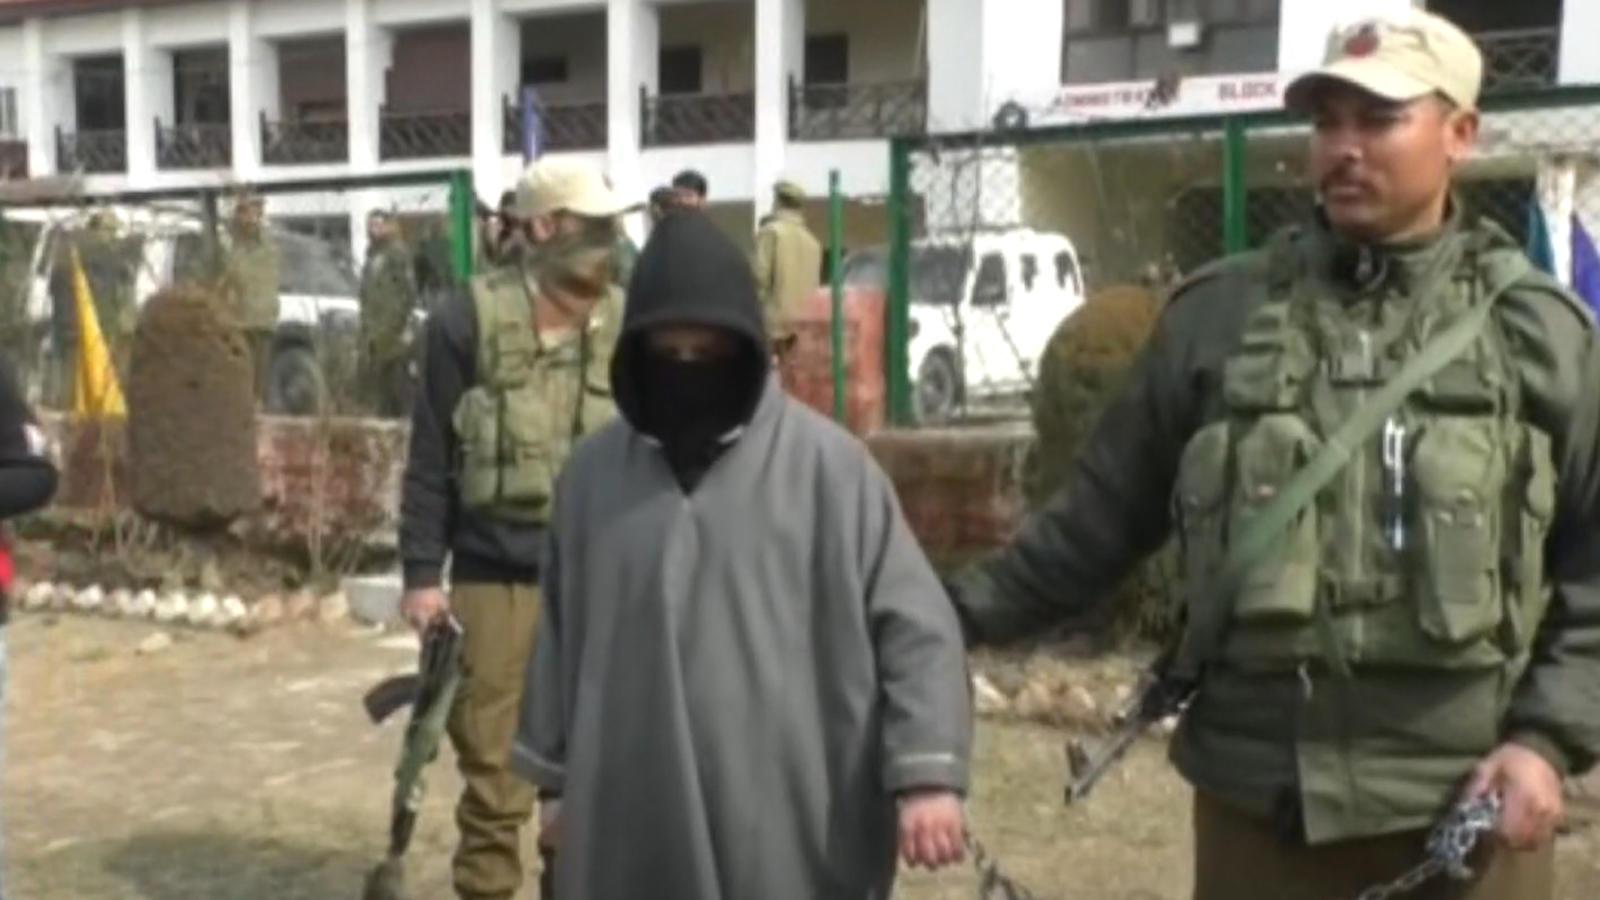 hizbul-mujahideen-terrorist-arrested-in-jks-baramulla